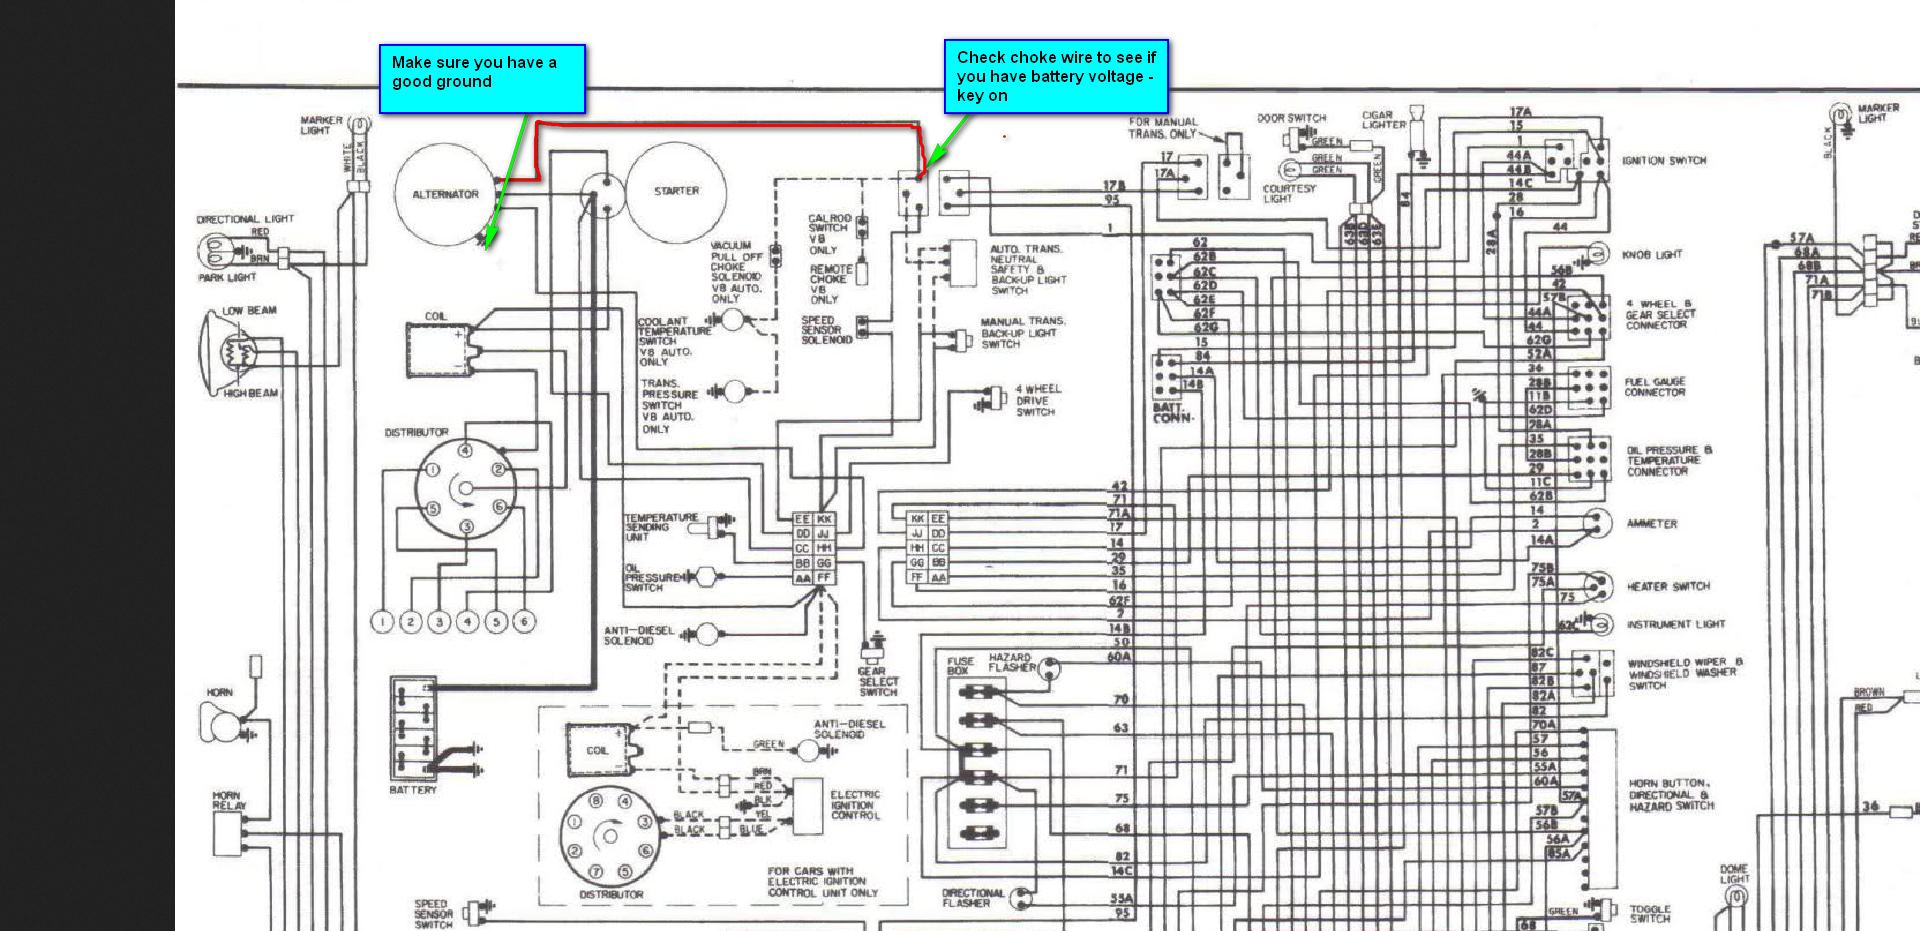 [DIAGRAM] 1977 International Scout Ii Wiring Diagram FULL ...